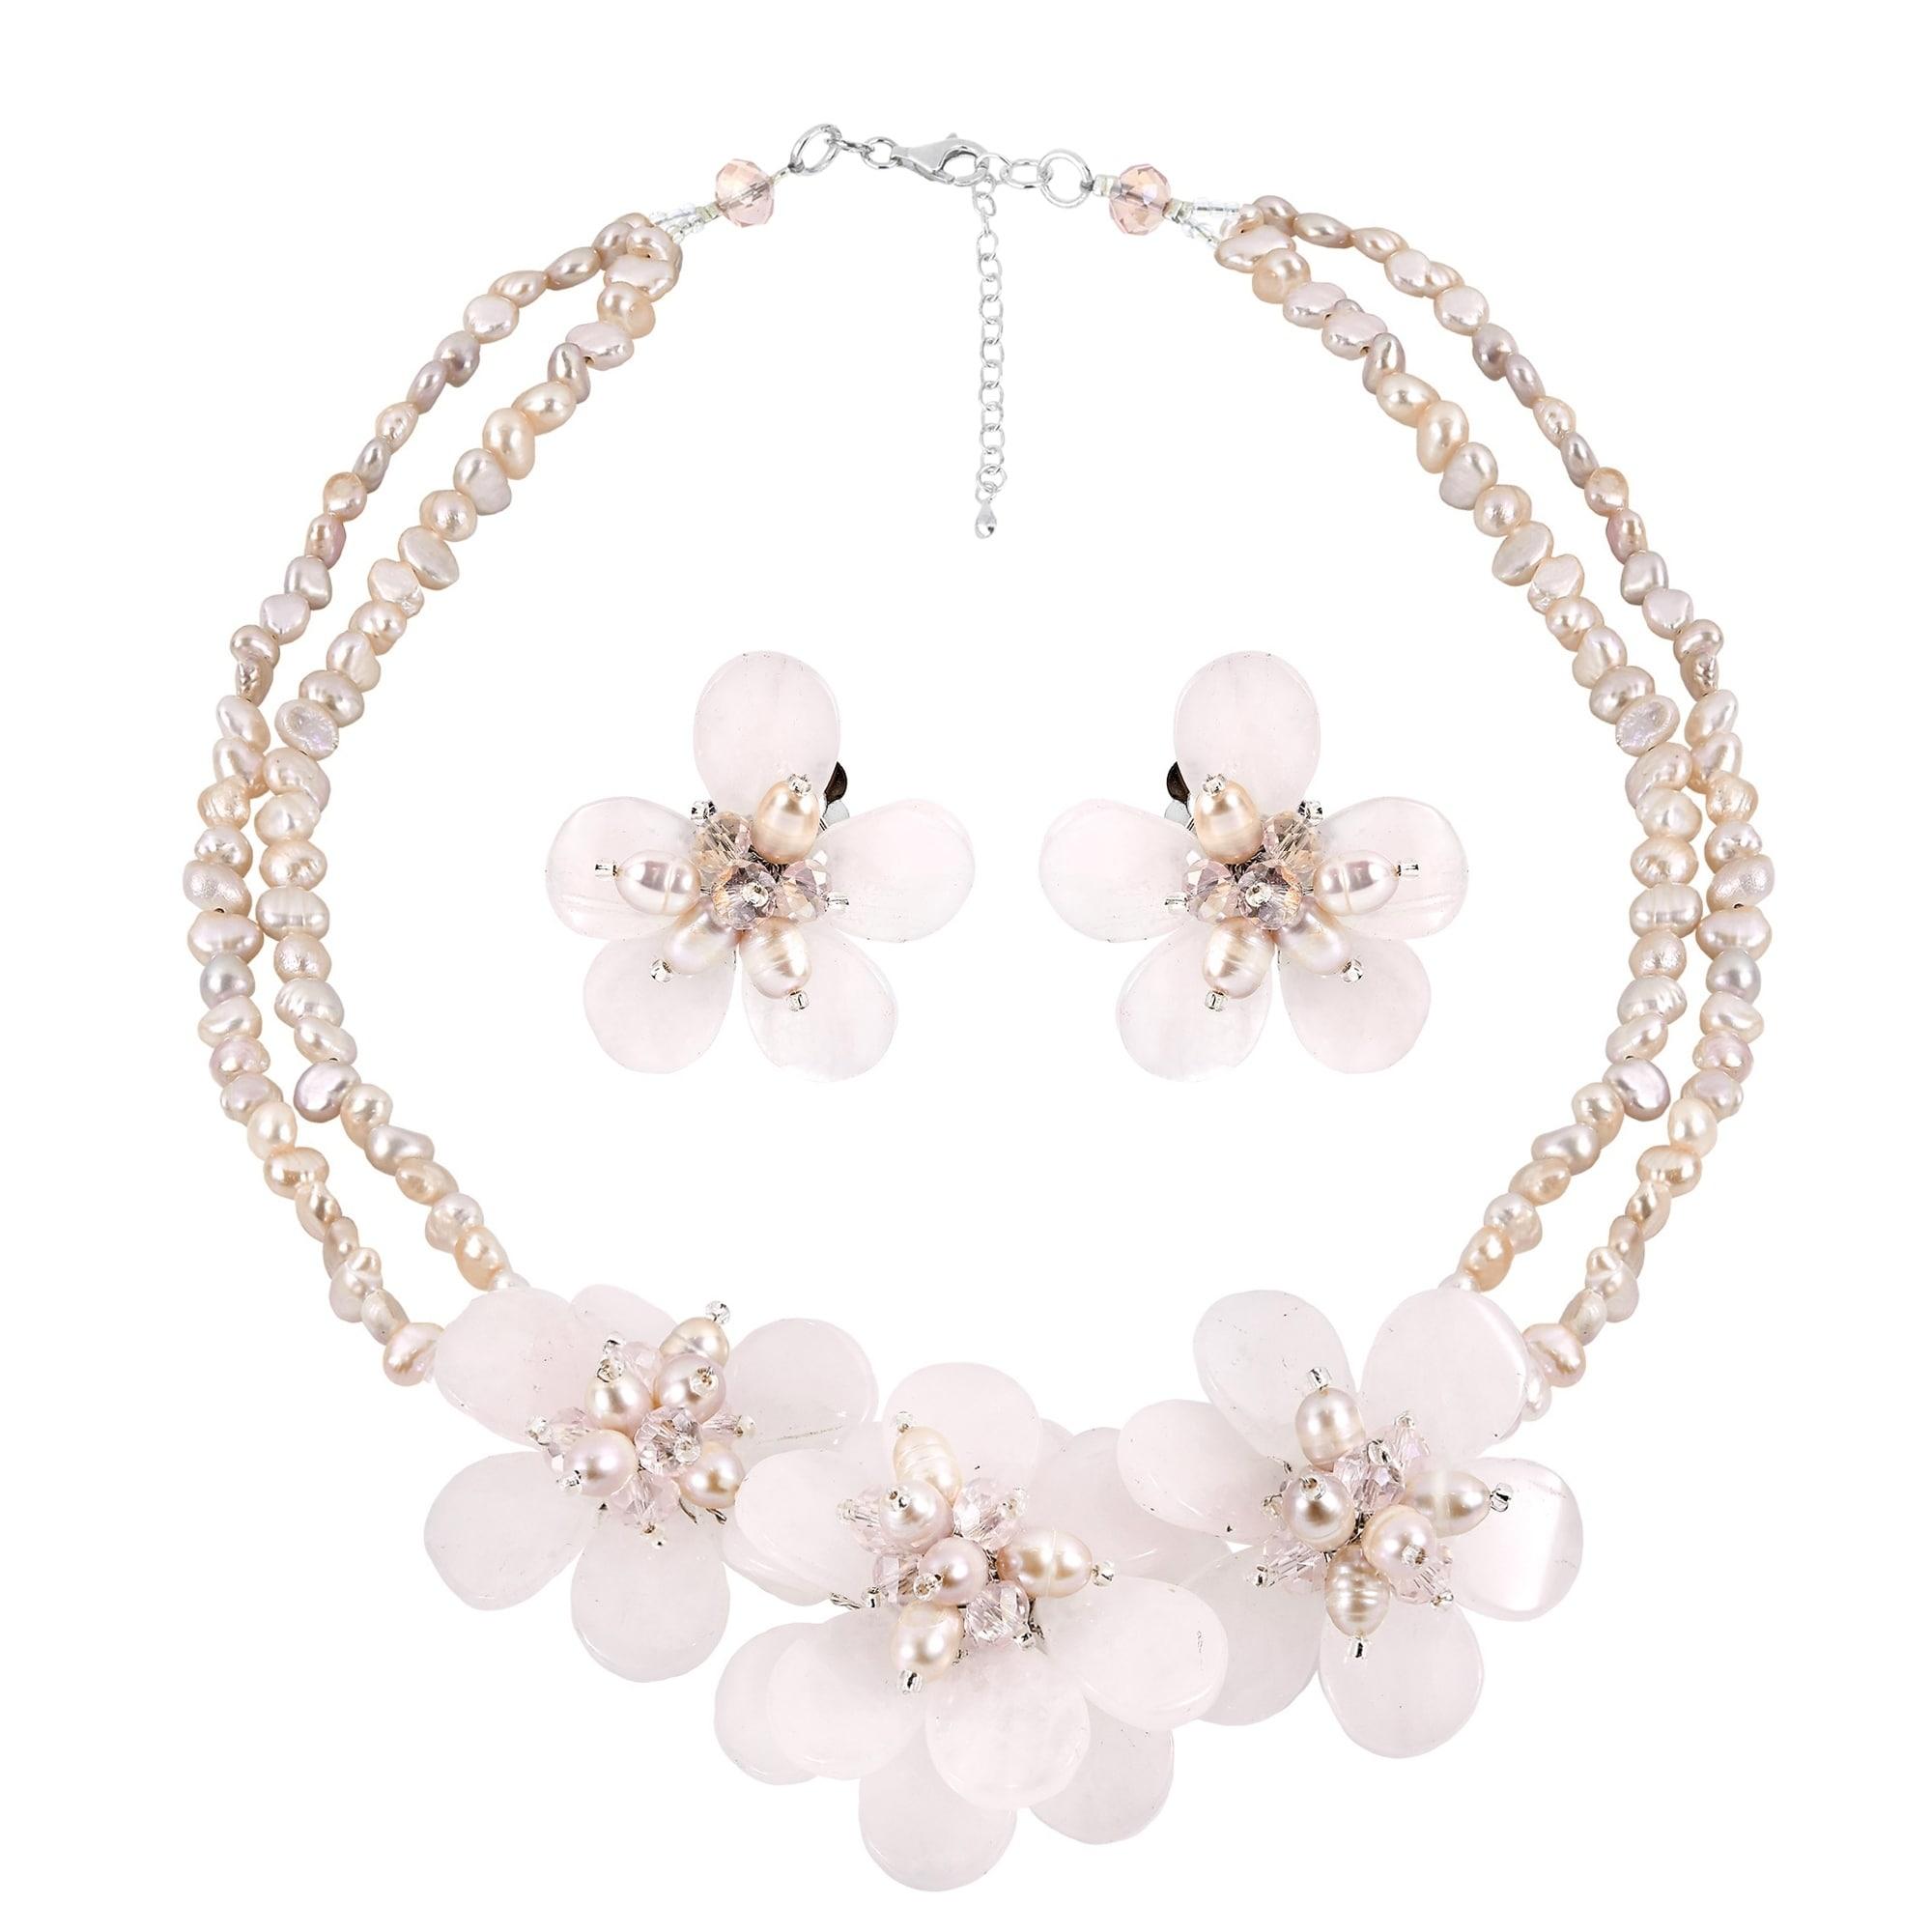 Shop Handmade Elegant Pink Quartz Stone And Pearl Flower Necklace